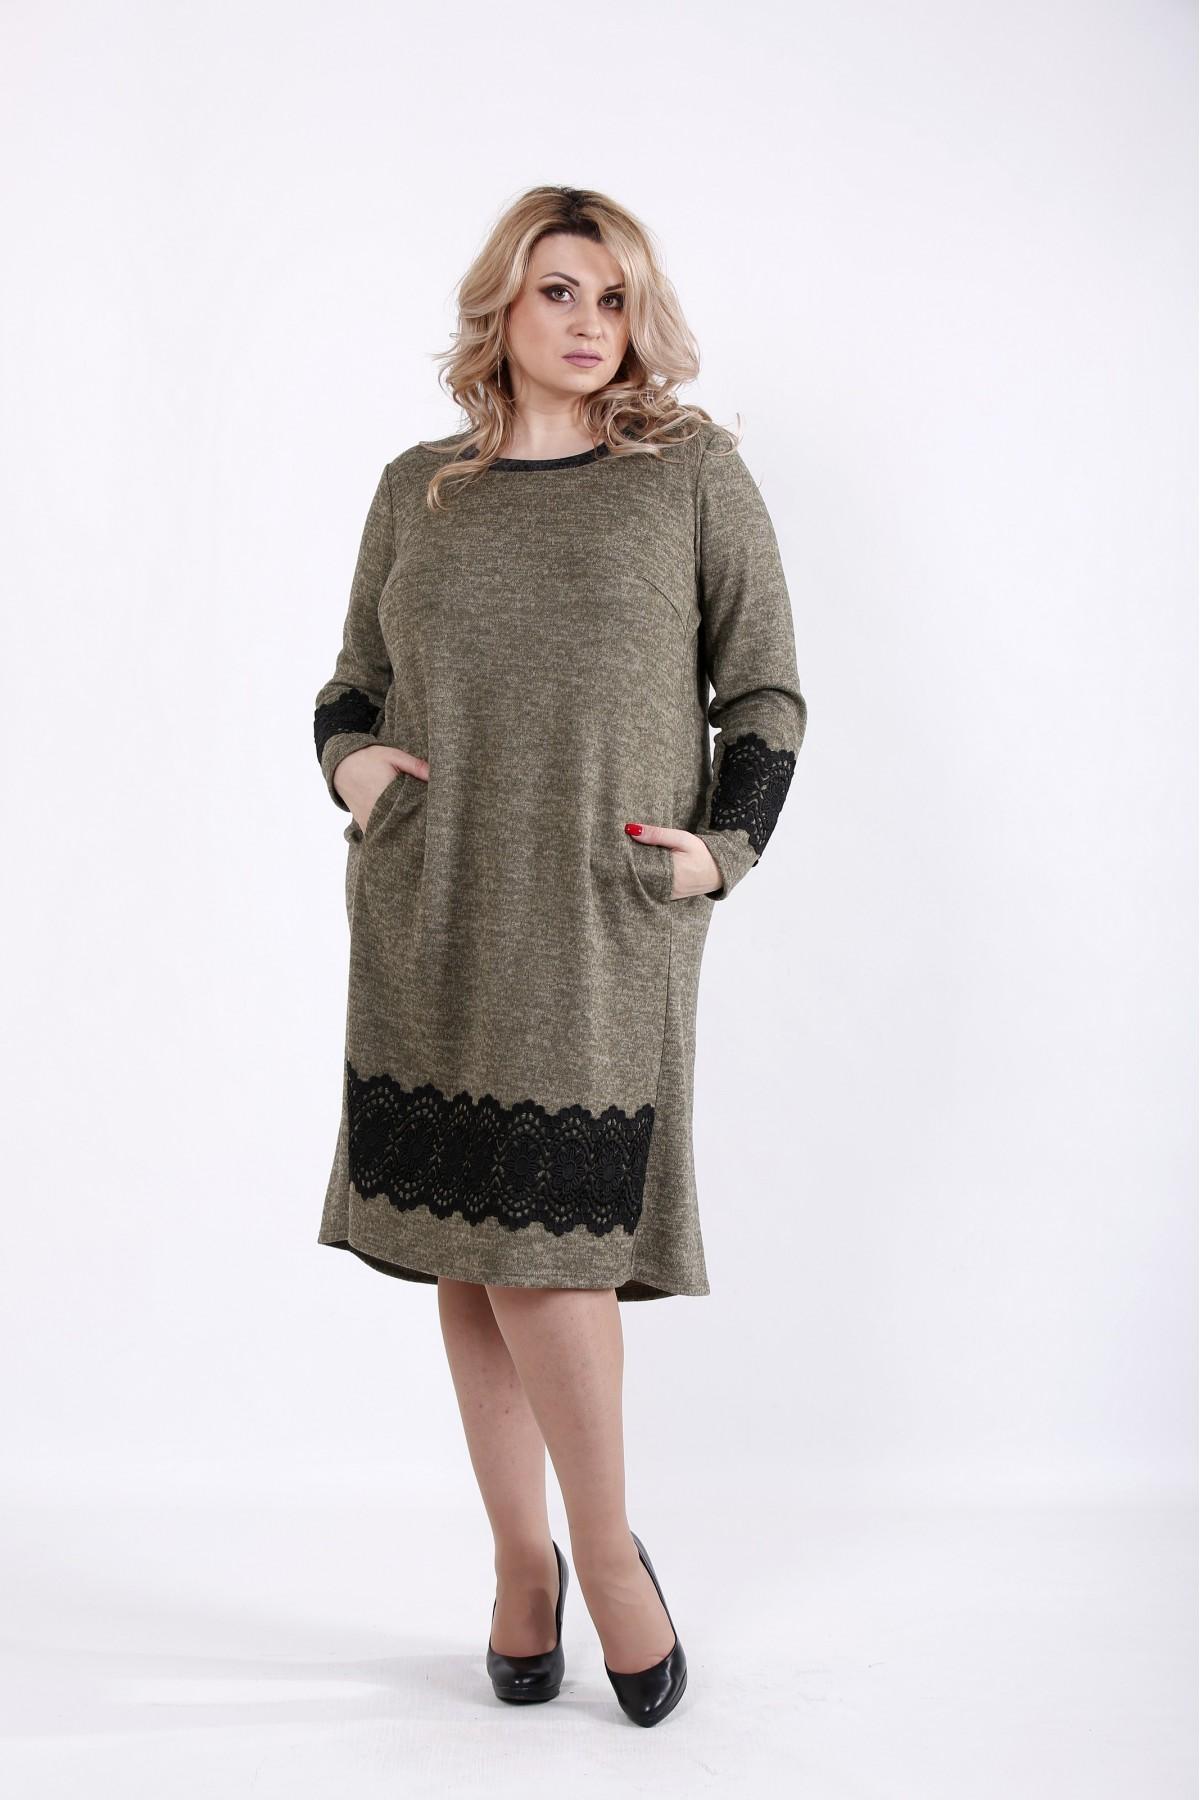 01048-2 | Горчичное платье миди